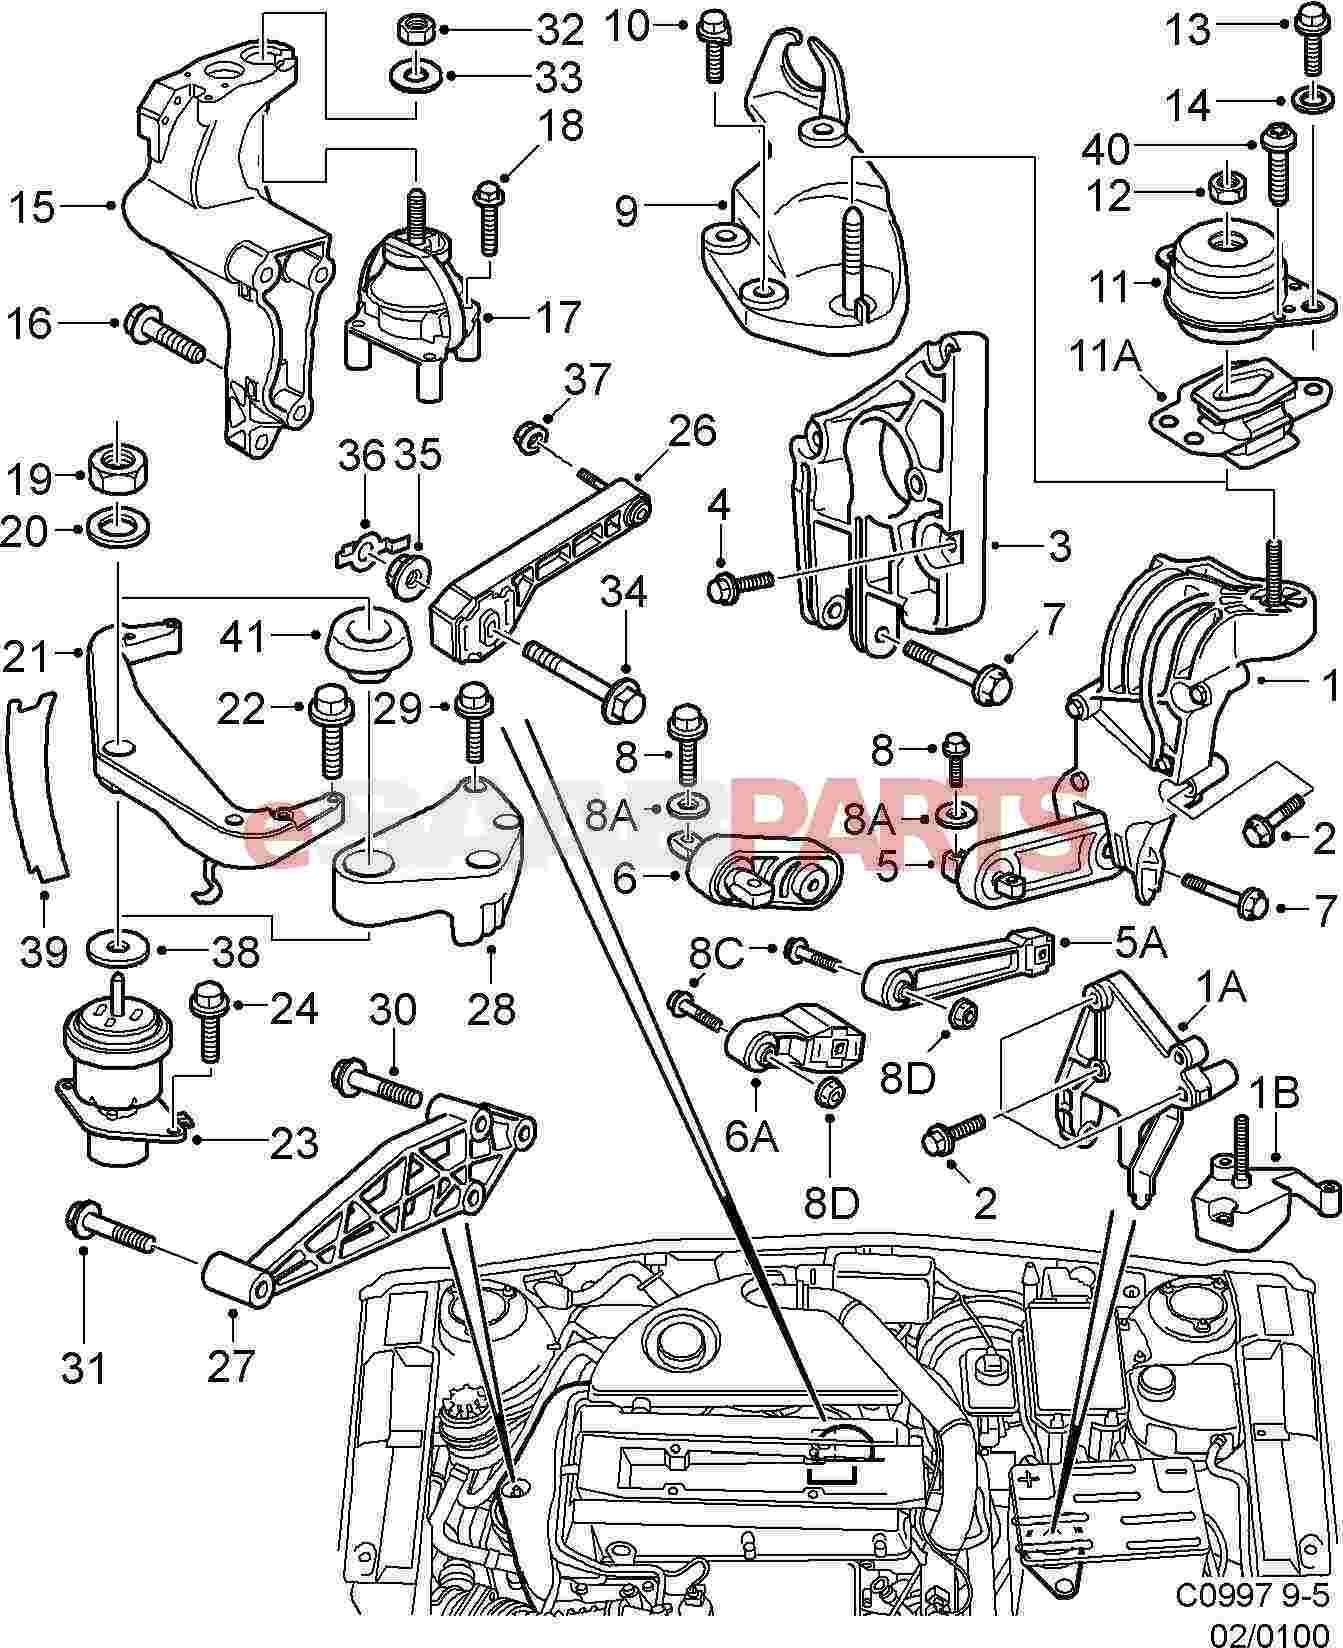 fw_0195] saab turbo diagram download diagram  stre gram cali amenti dhjem cosa inki ologi cana greas hendil phil cajos  hendil mohammedshrine librar wiring 101